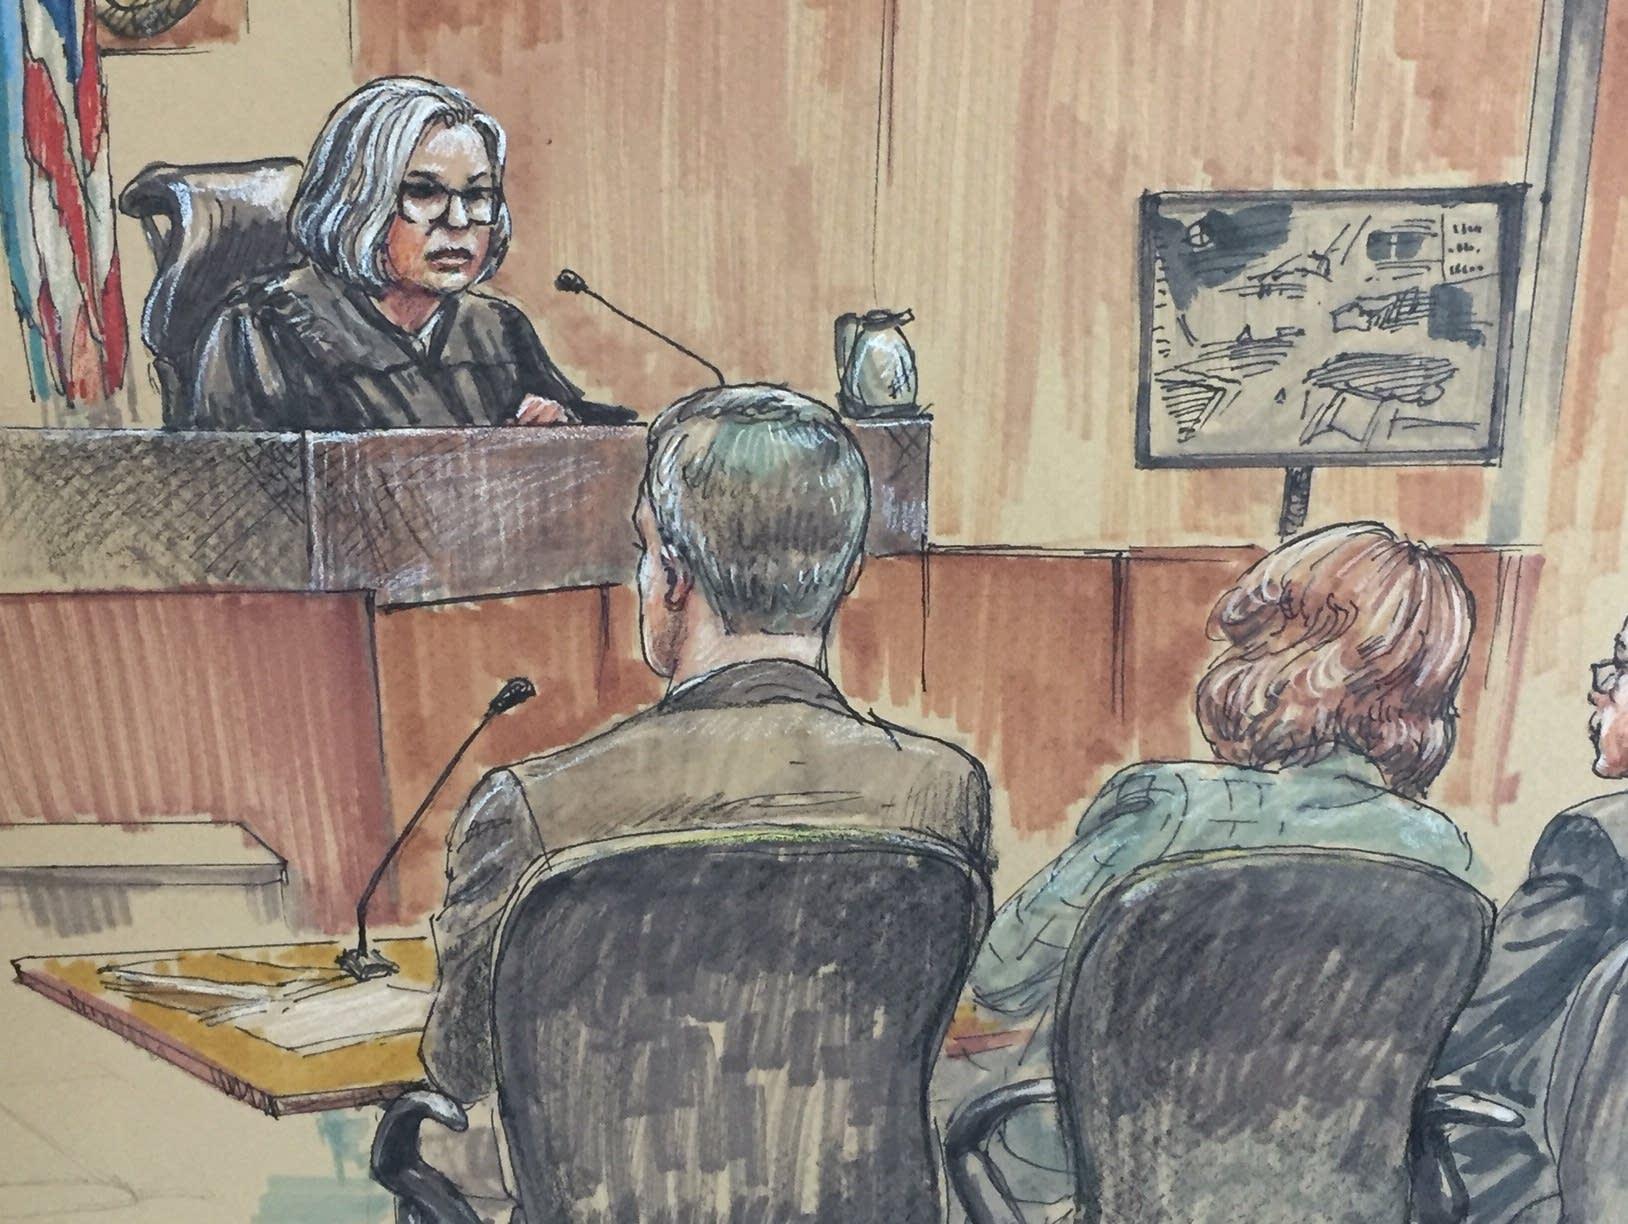 Inside the courtroom at Mohamed Noor's trial on Monday, April 2, 2019.